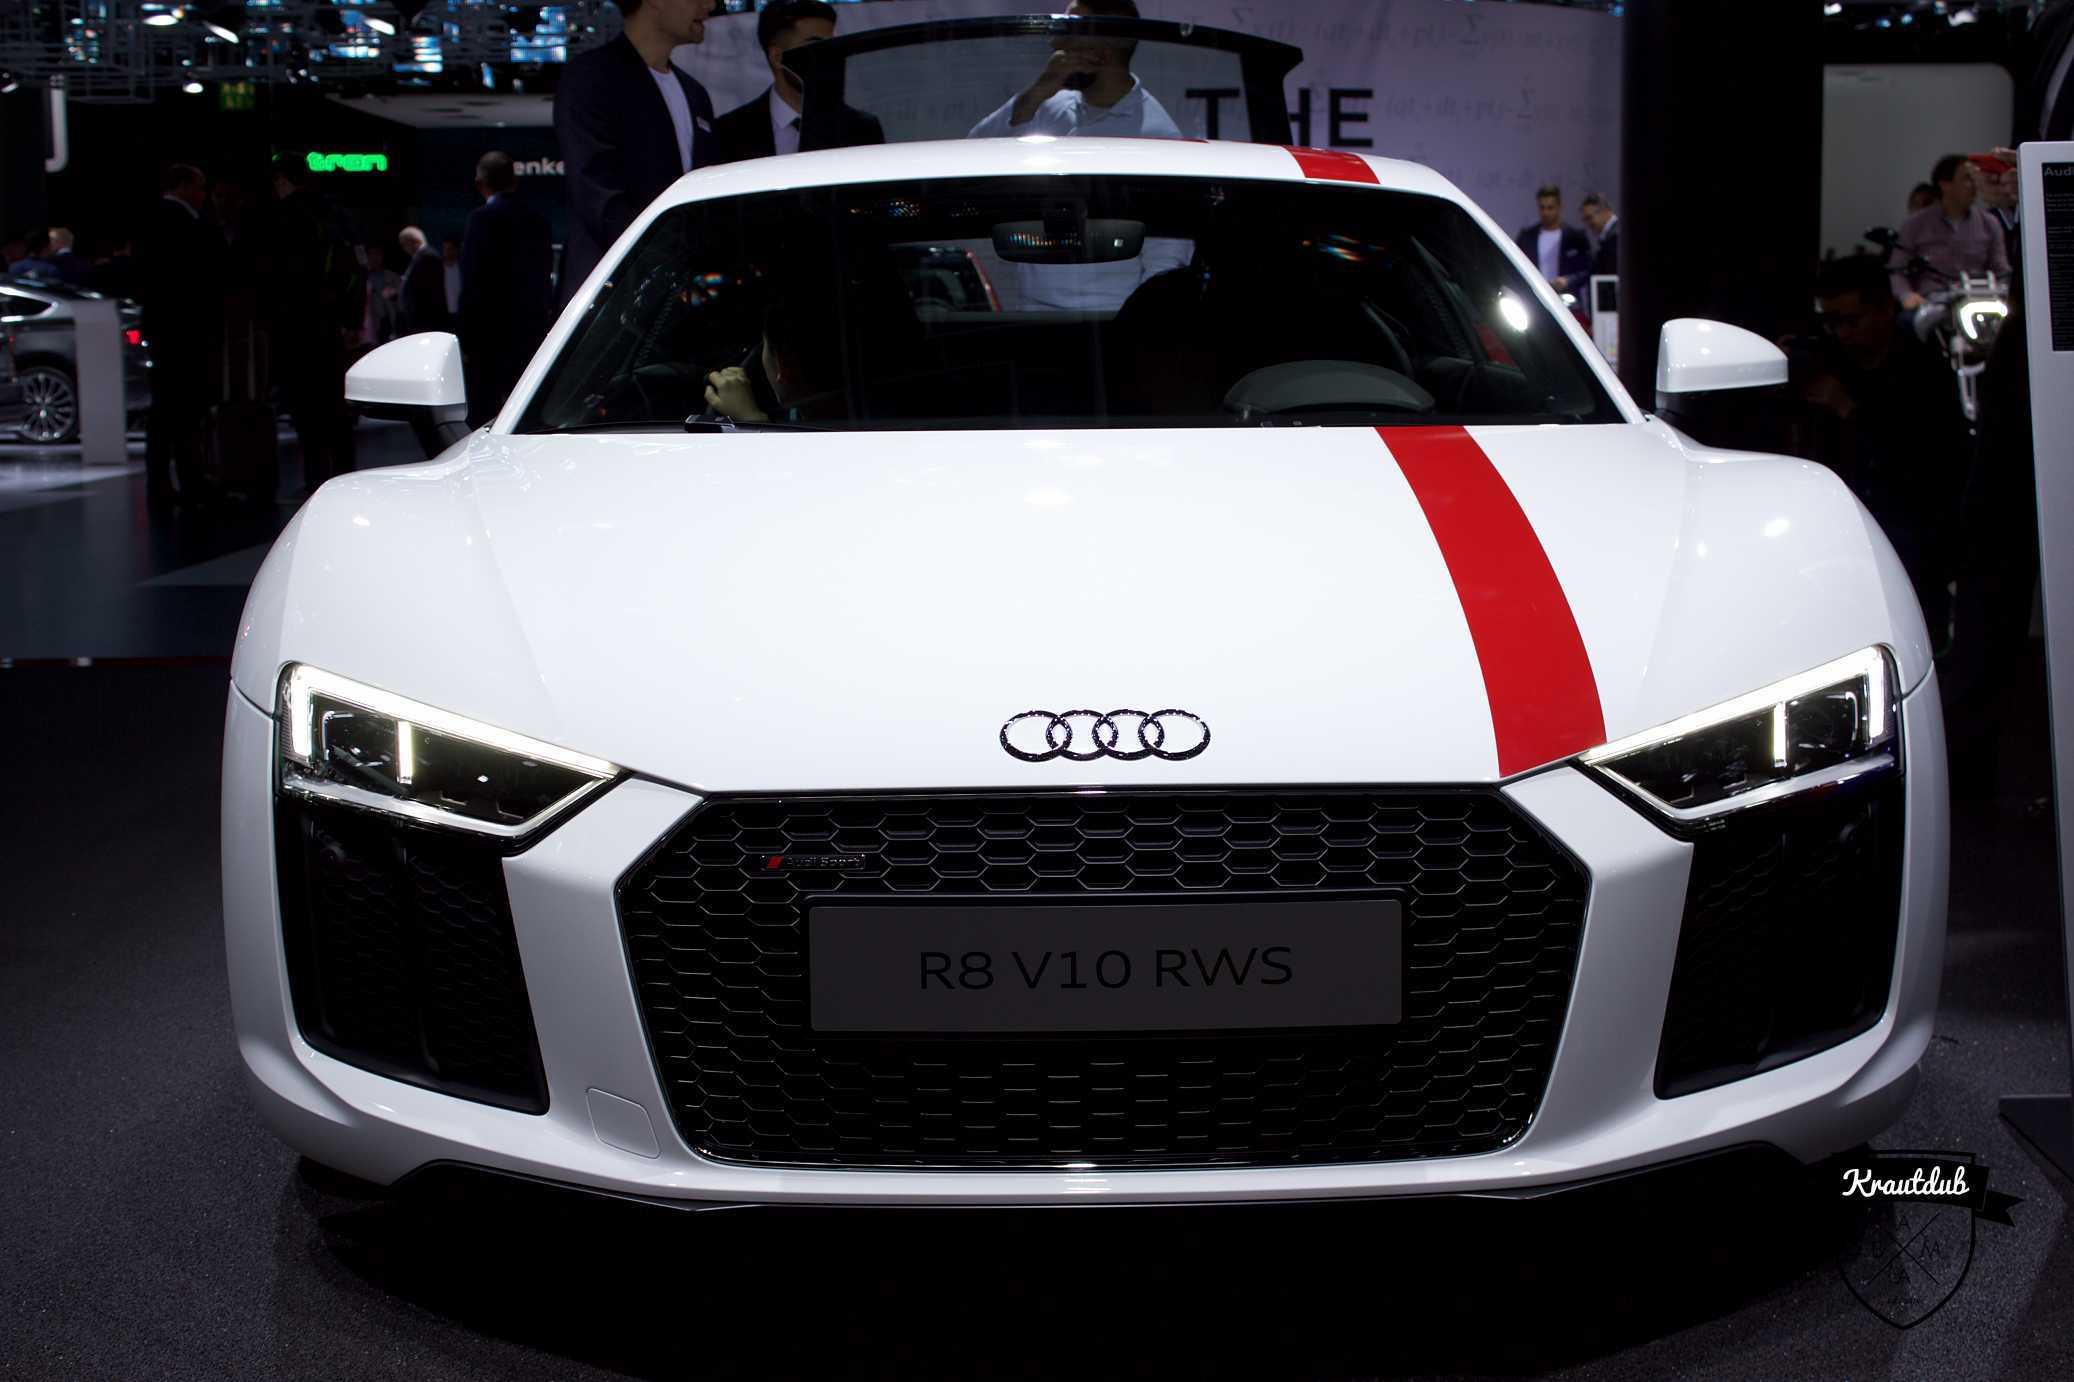 Audi R8 V10 RWS - IAA 2017